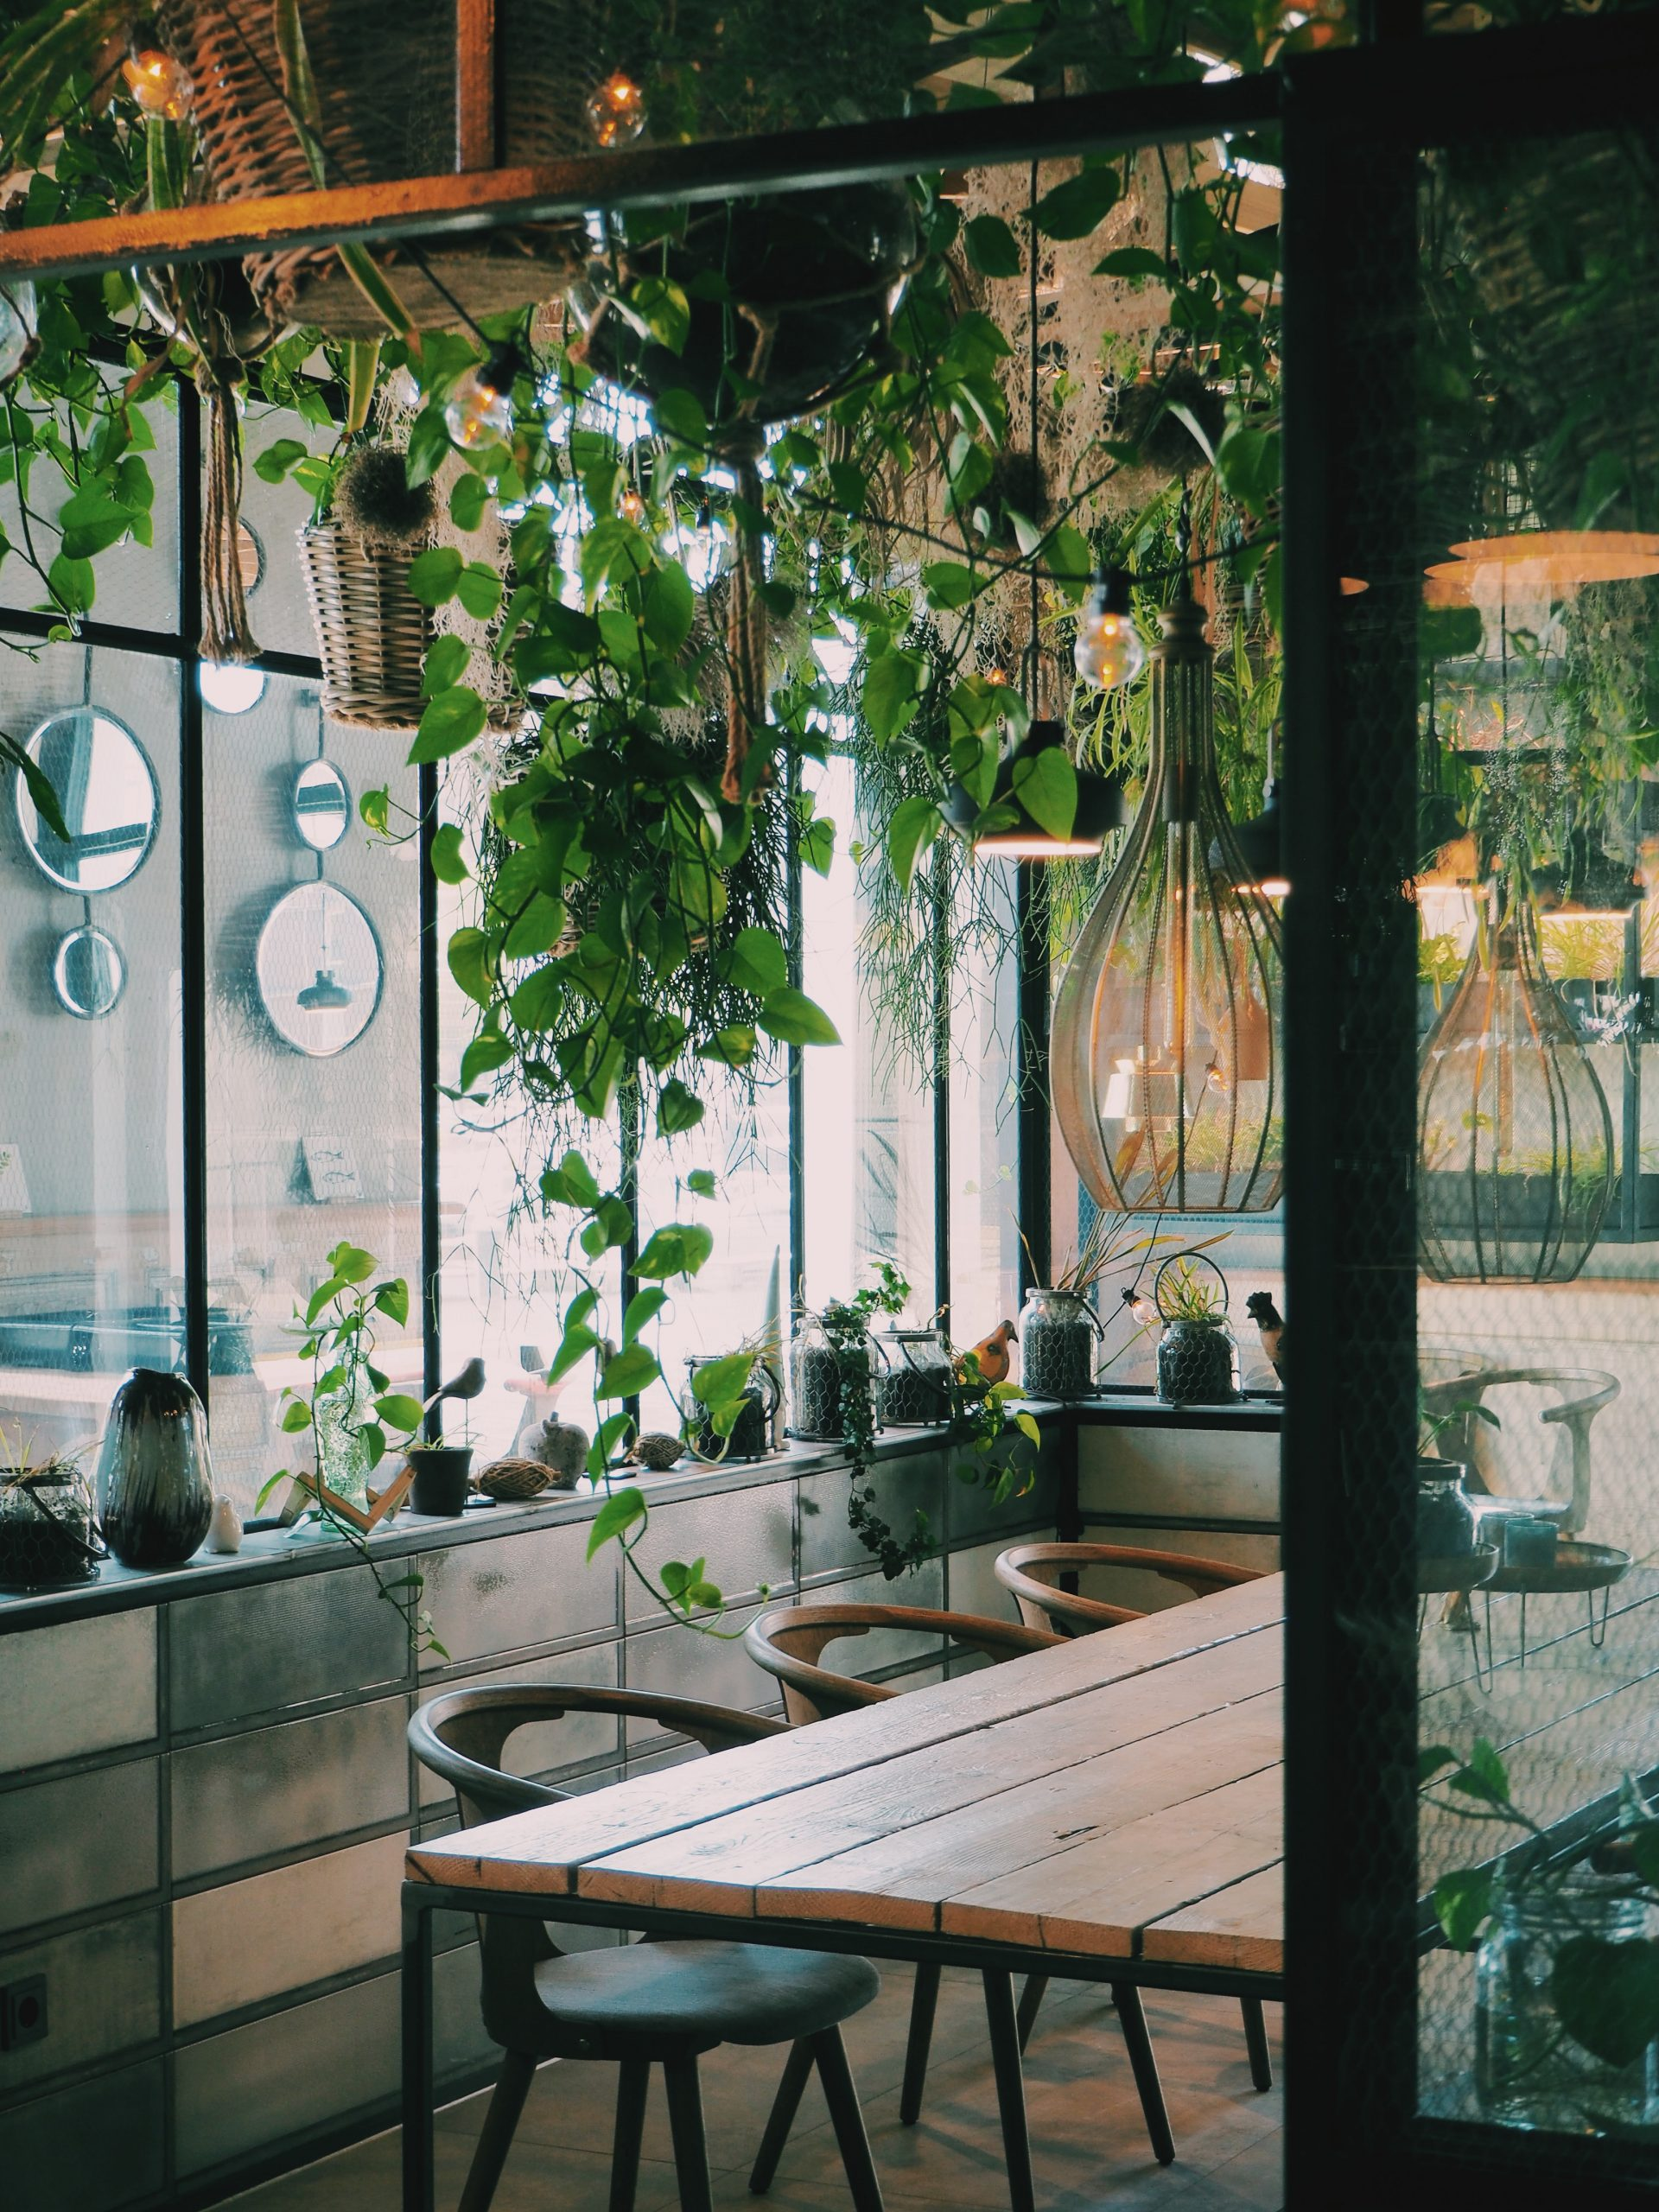 Four Elements Hotel duurzaam hotel Amsterdam Solon Travel